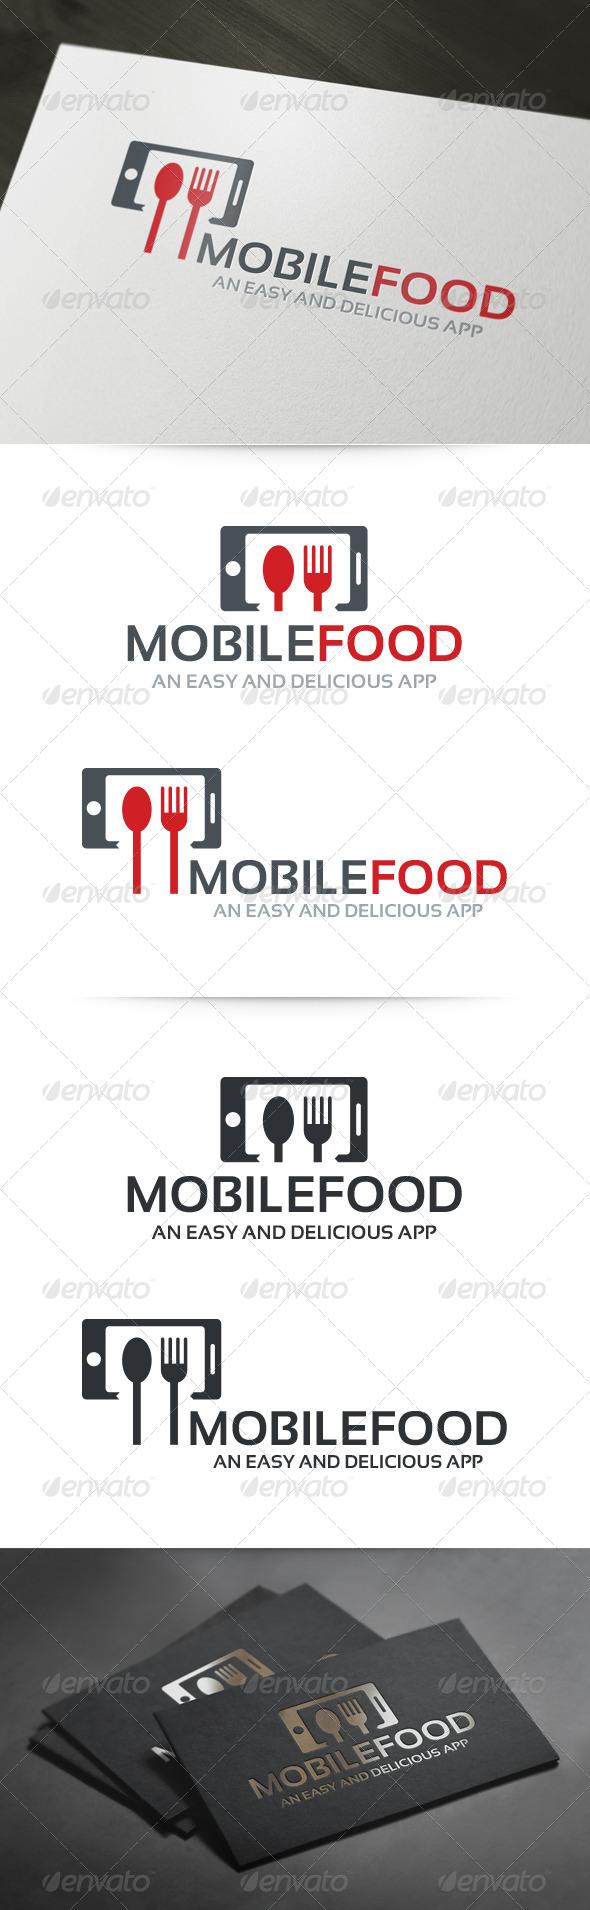 Mobile Food Logo